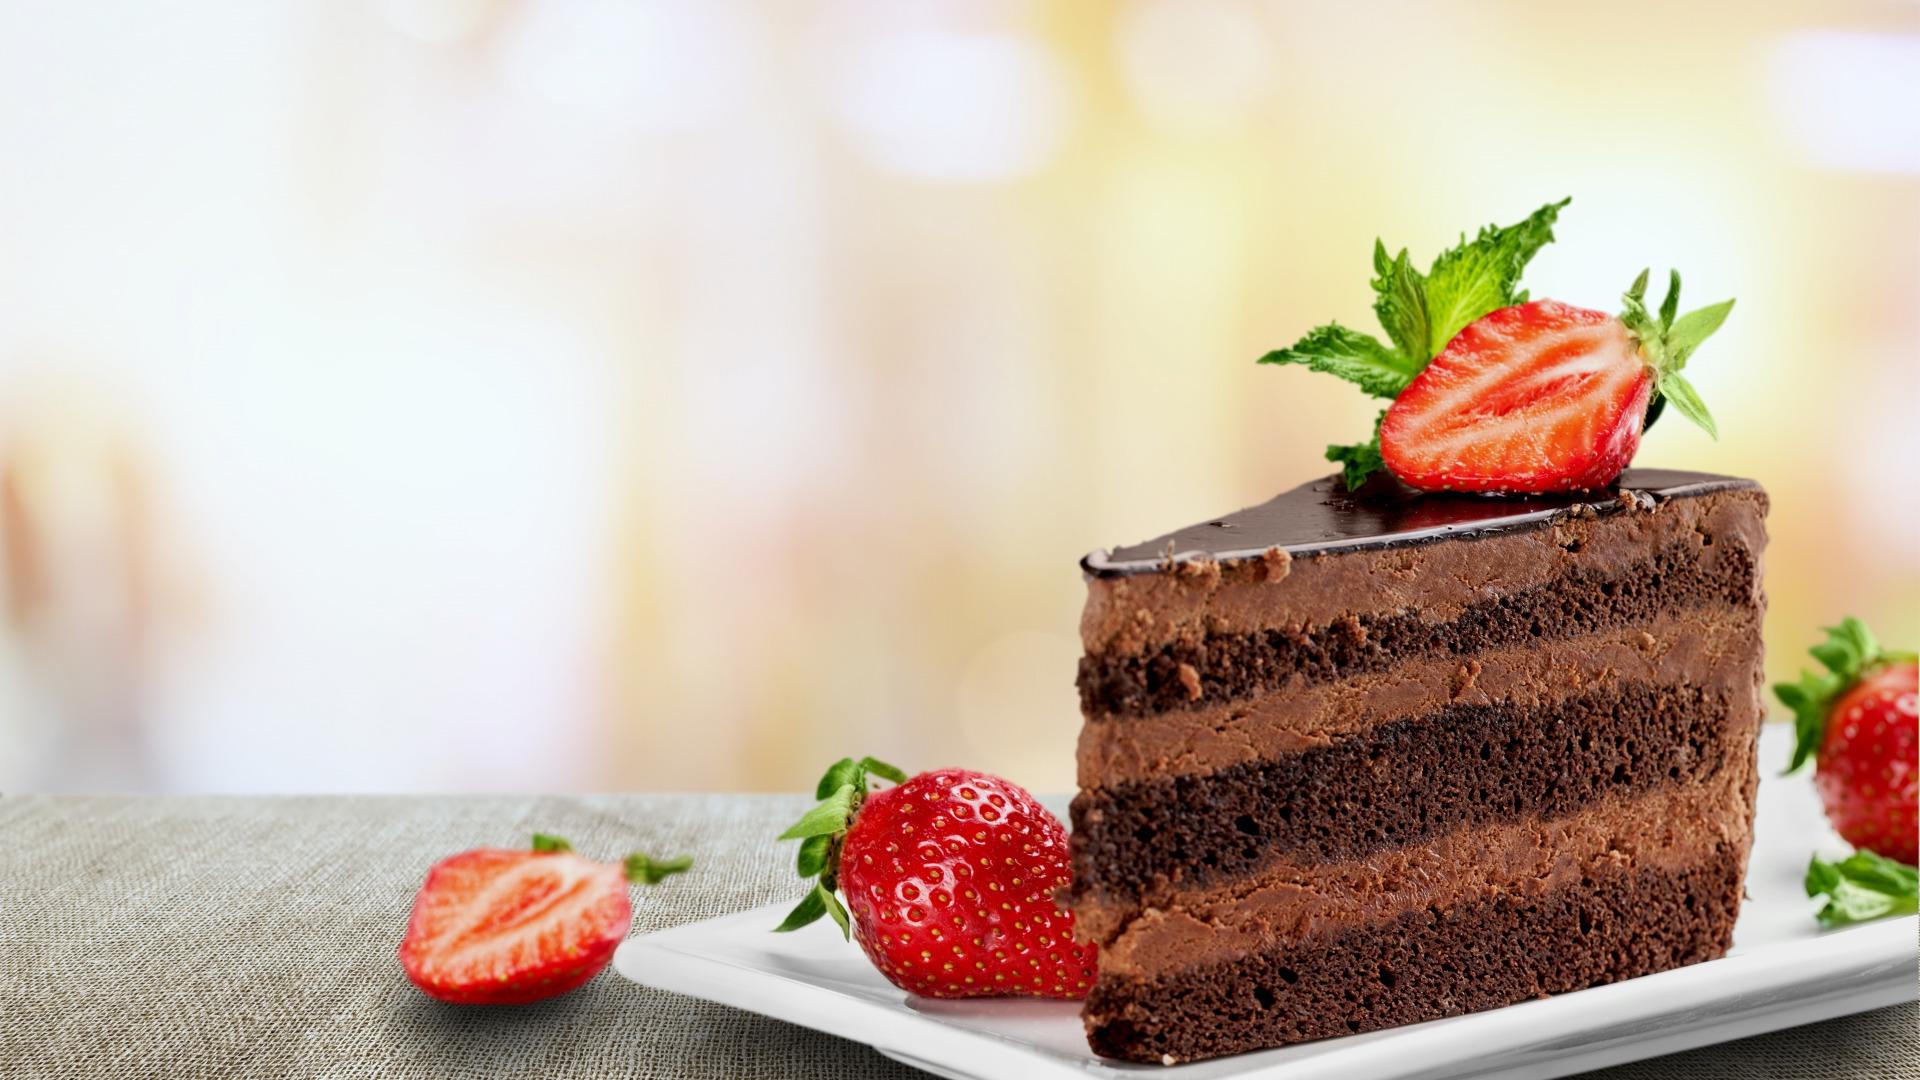 ютуб картинки торт длина зачастую